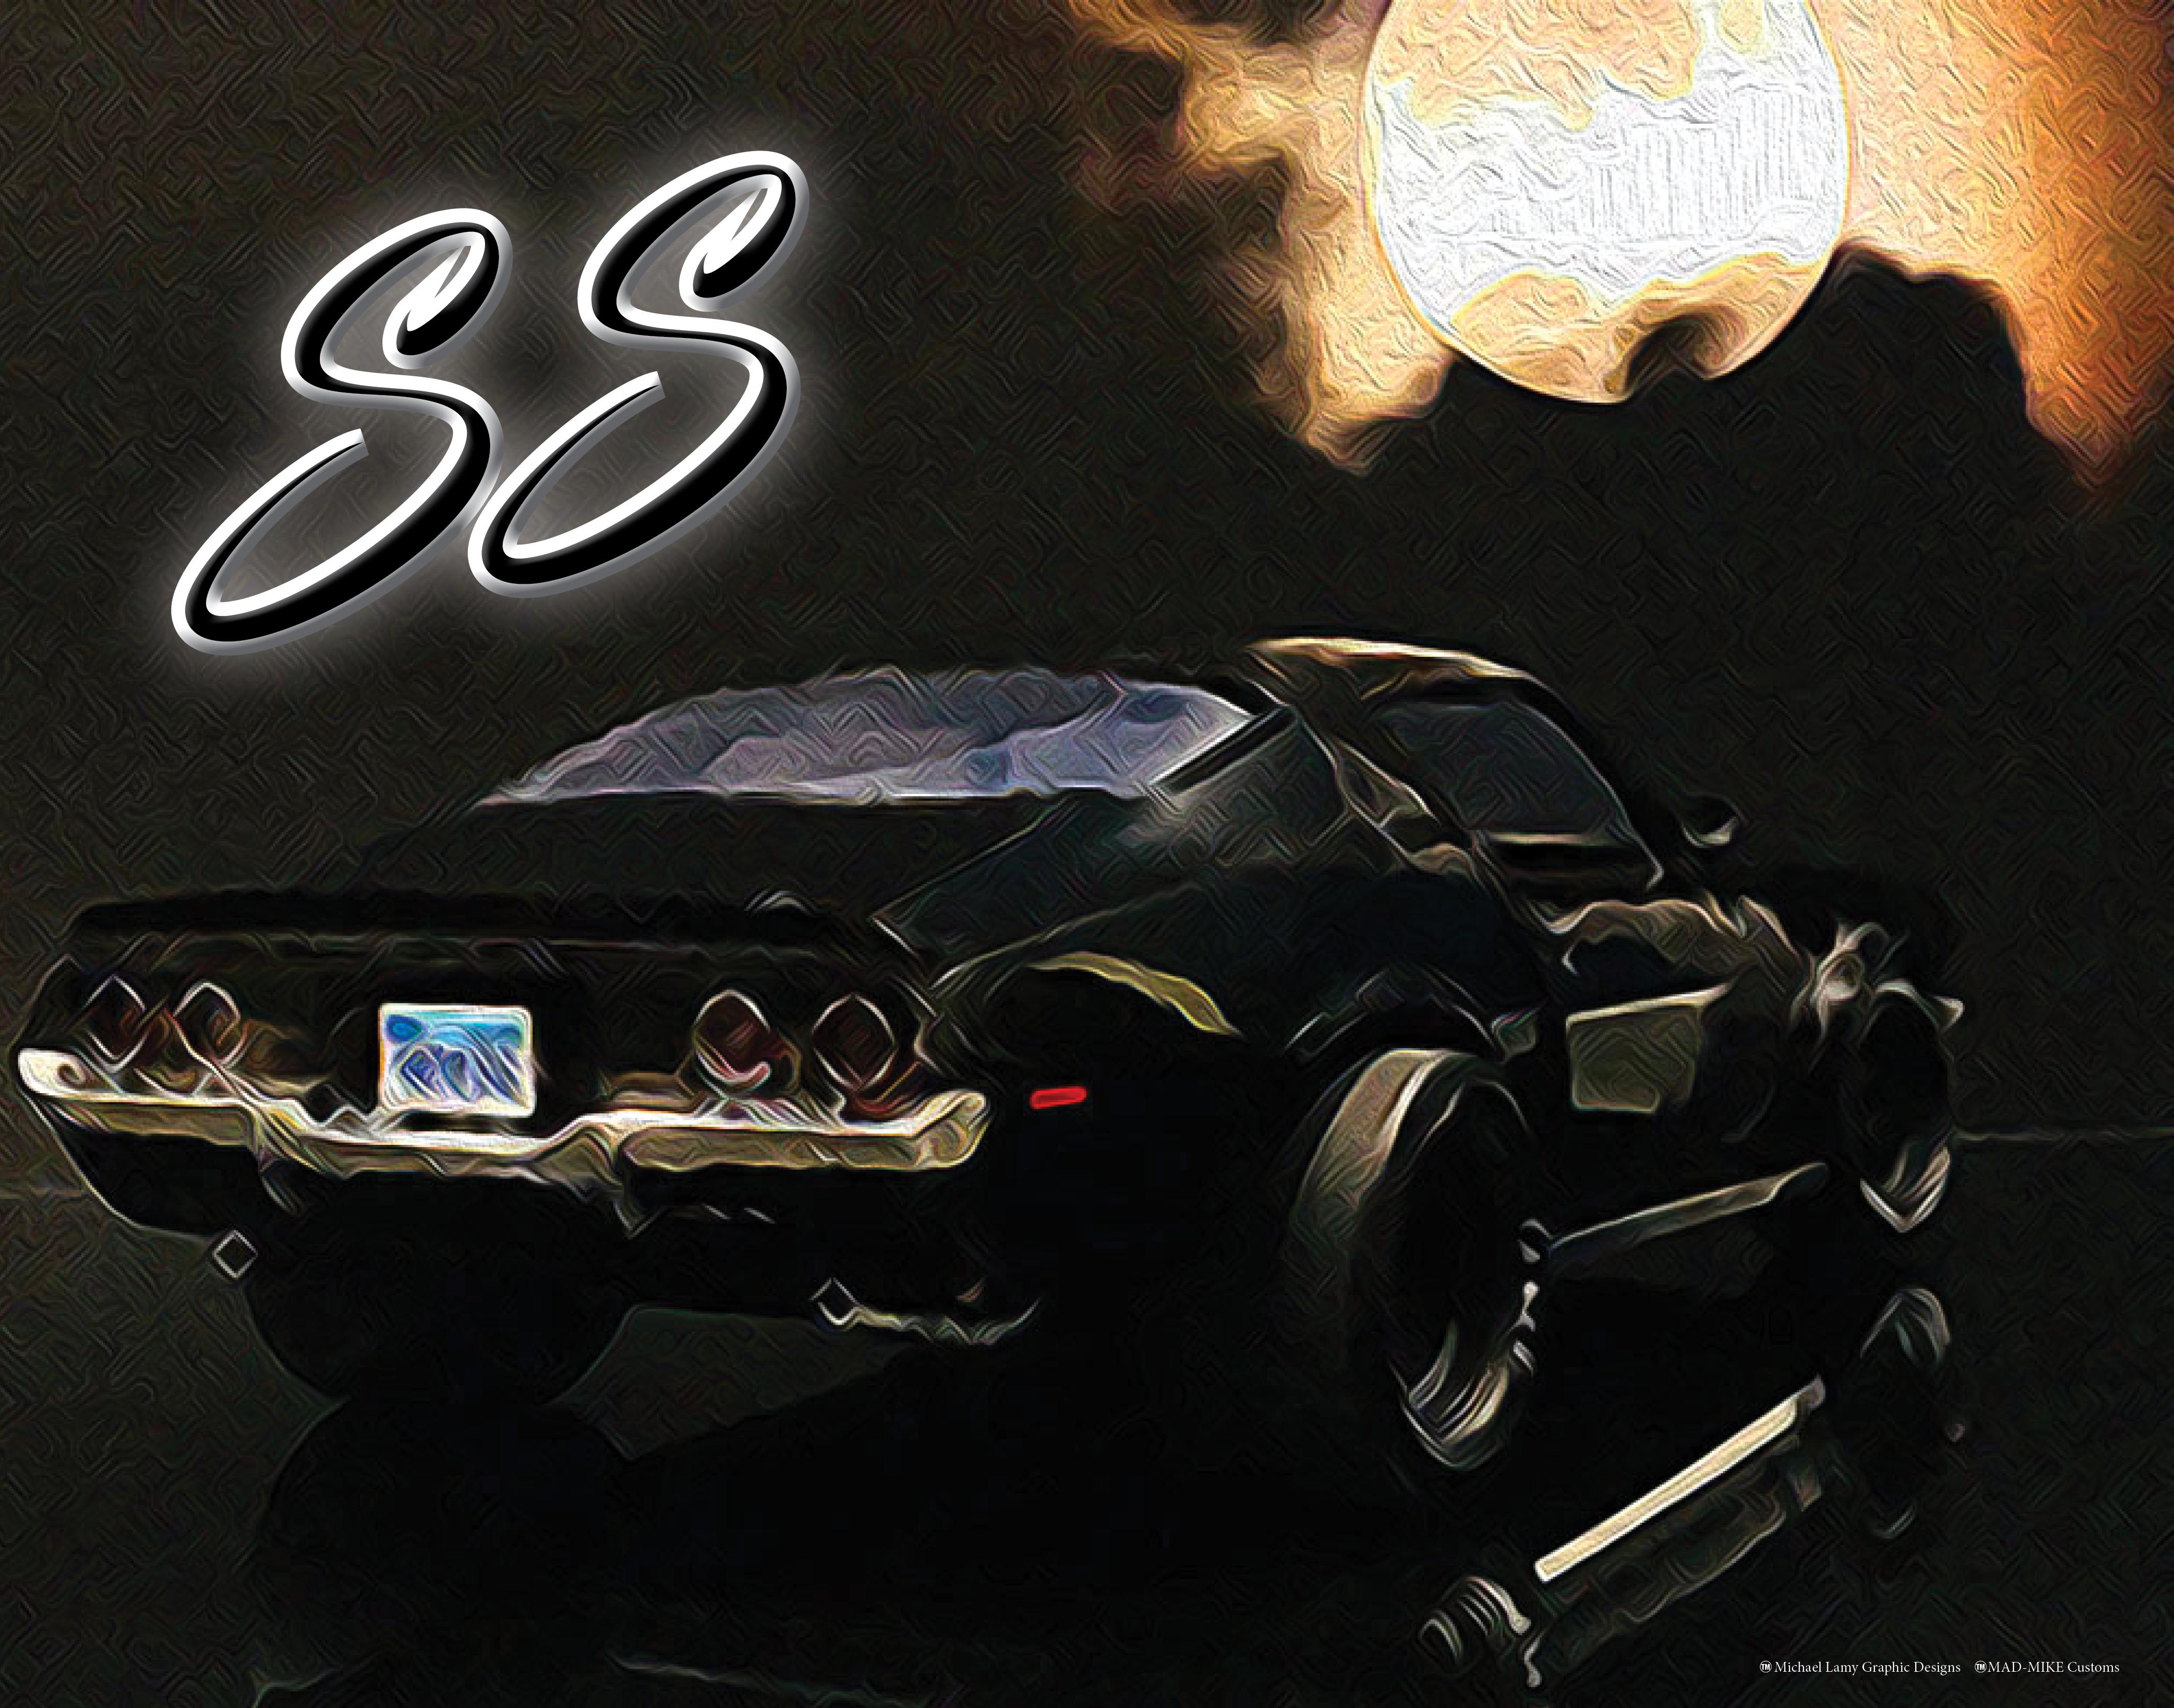 blackcamaropaintingArt11x14 copy